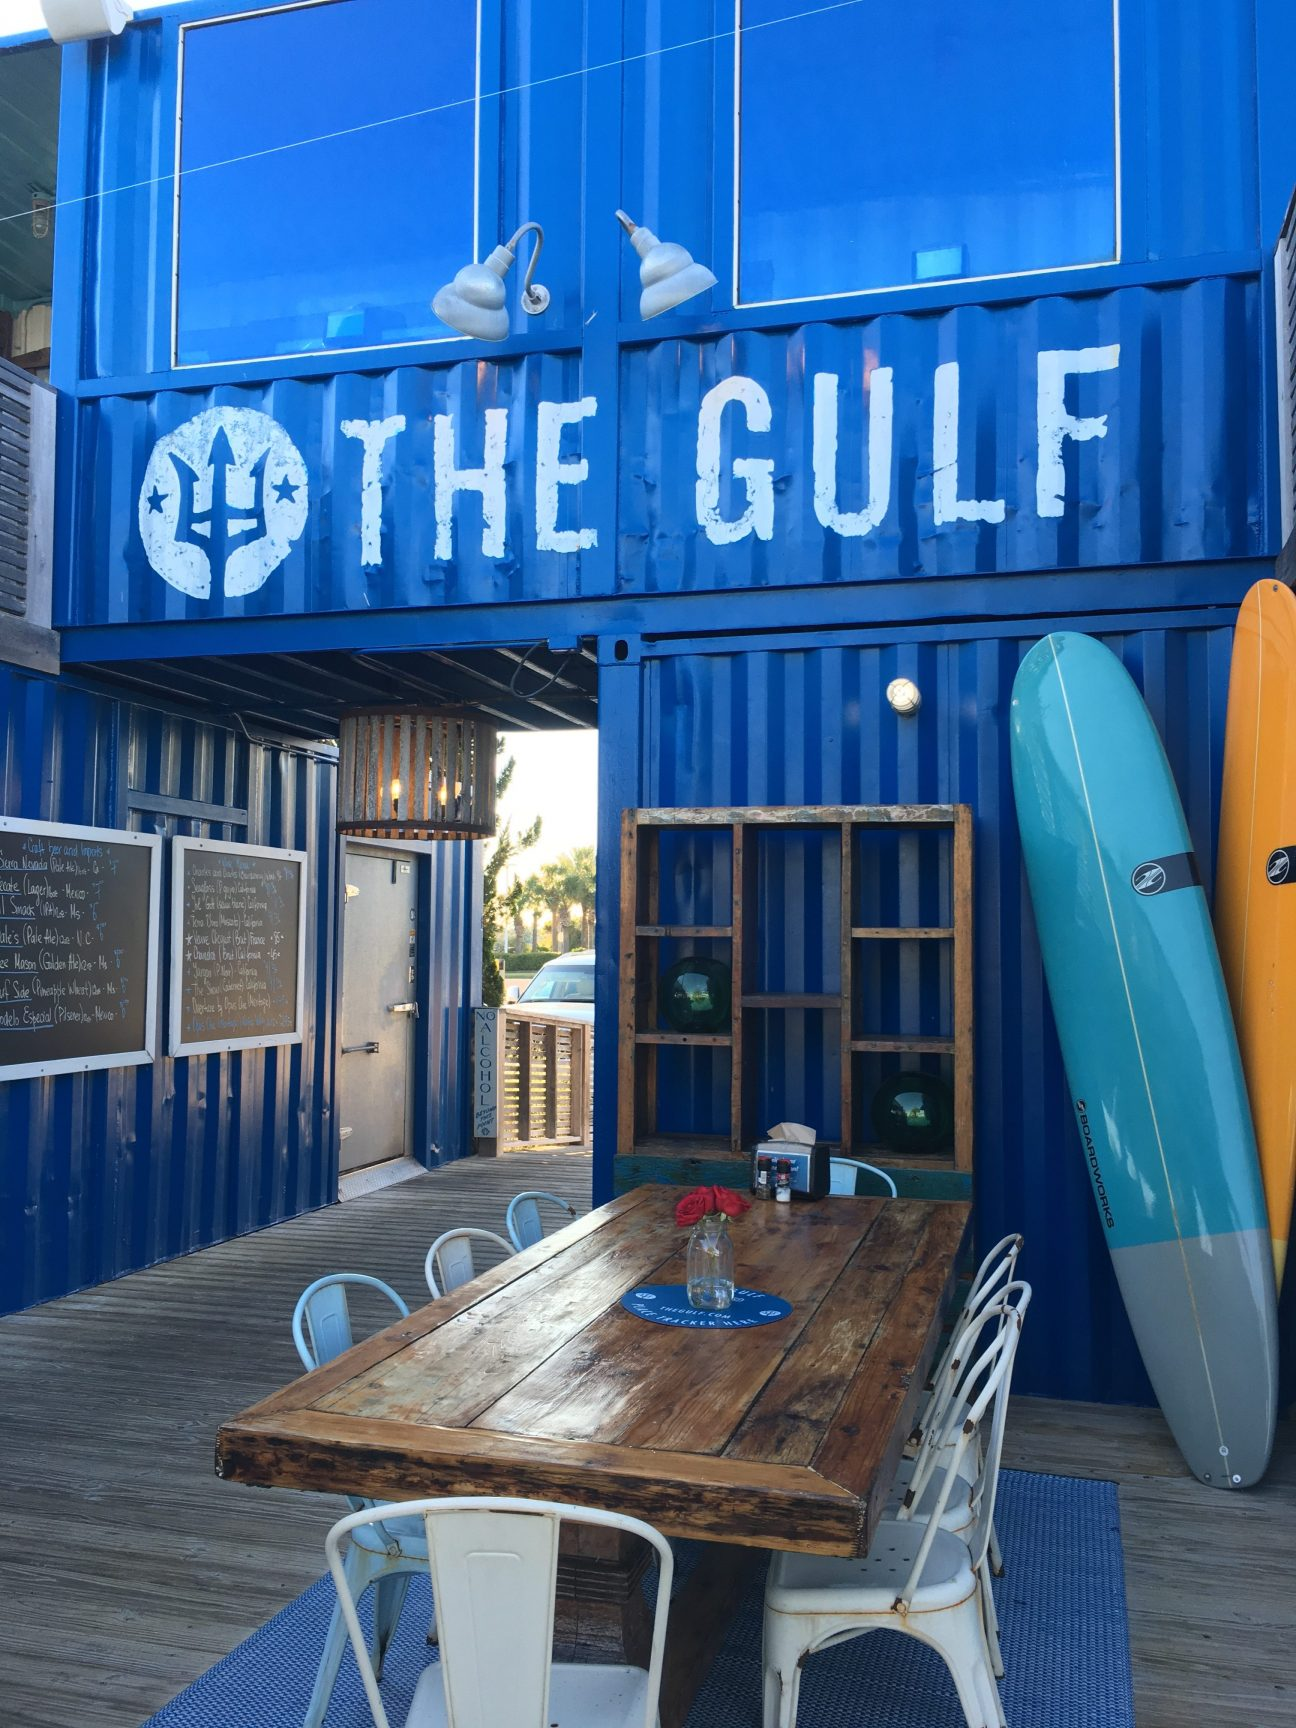 Decor at The Gulf, a seaside restaurant in Orange Beach, Alabama.